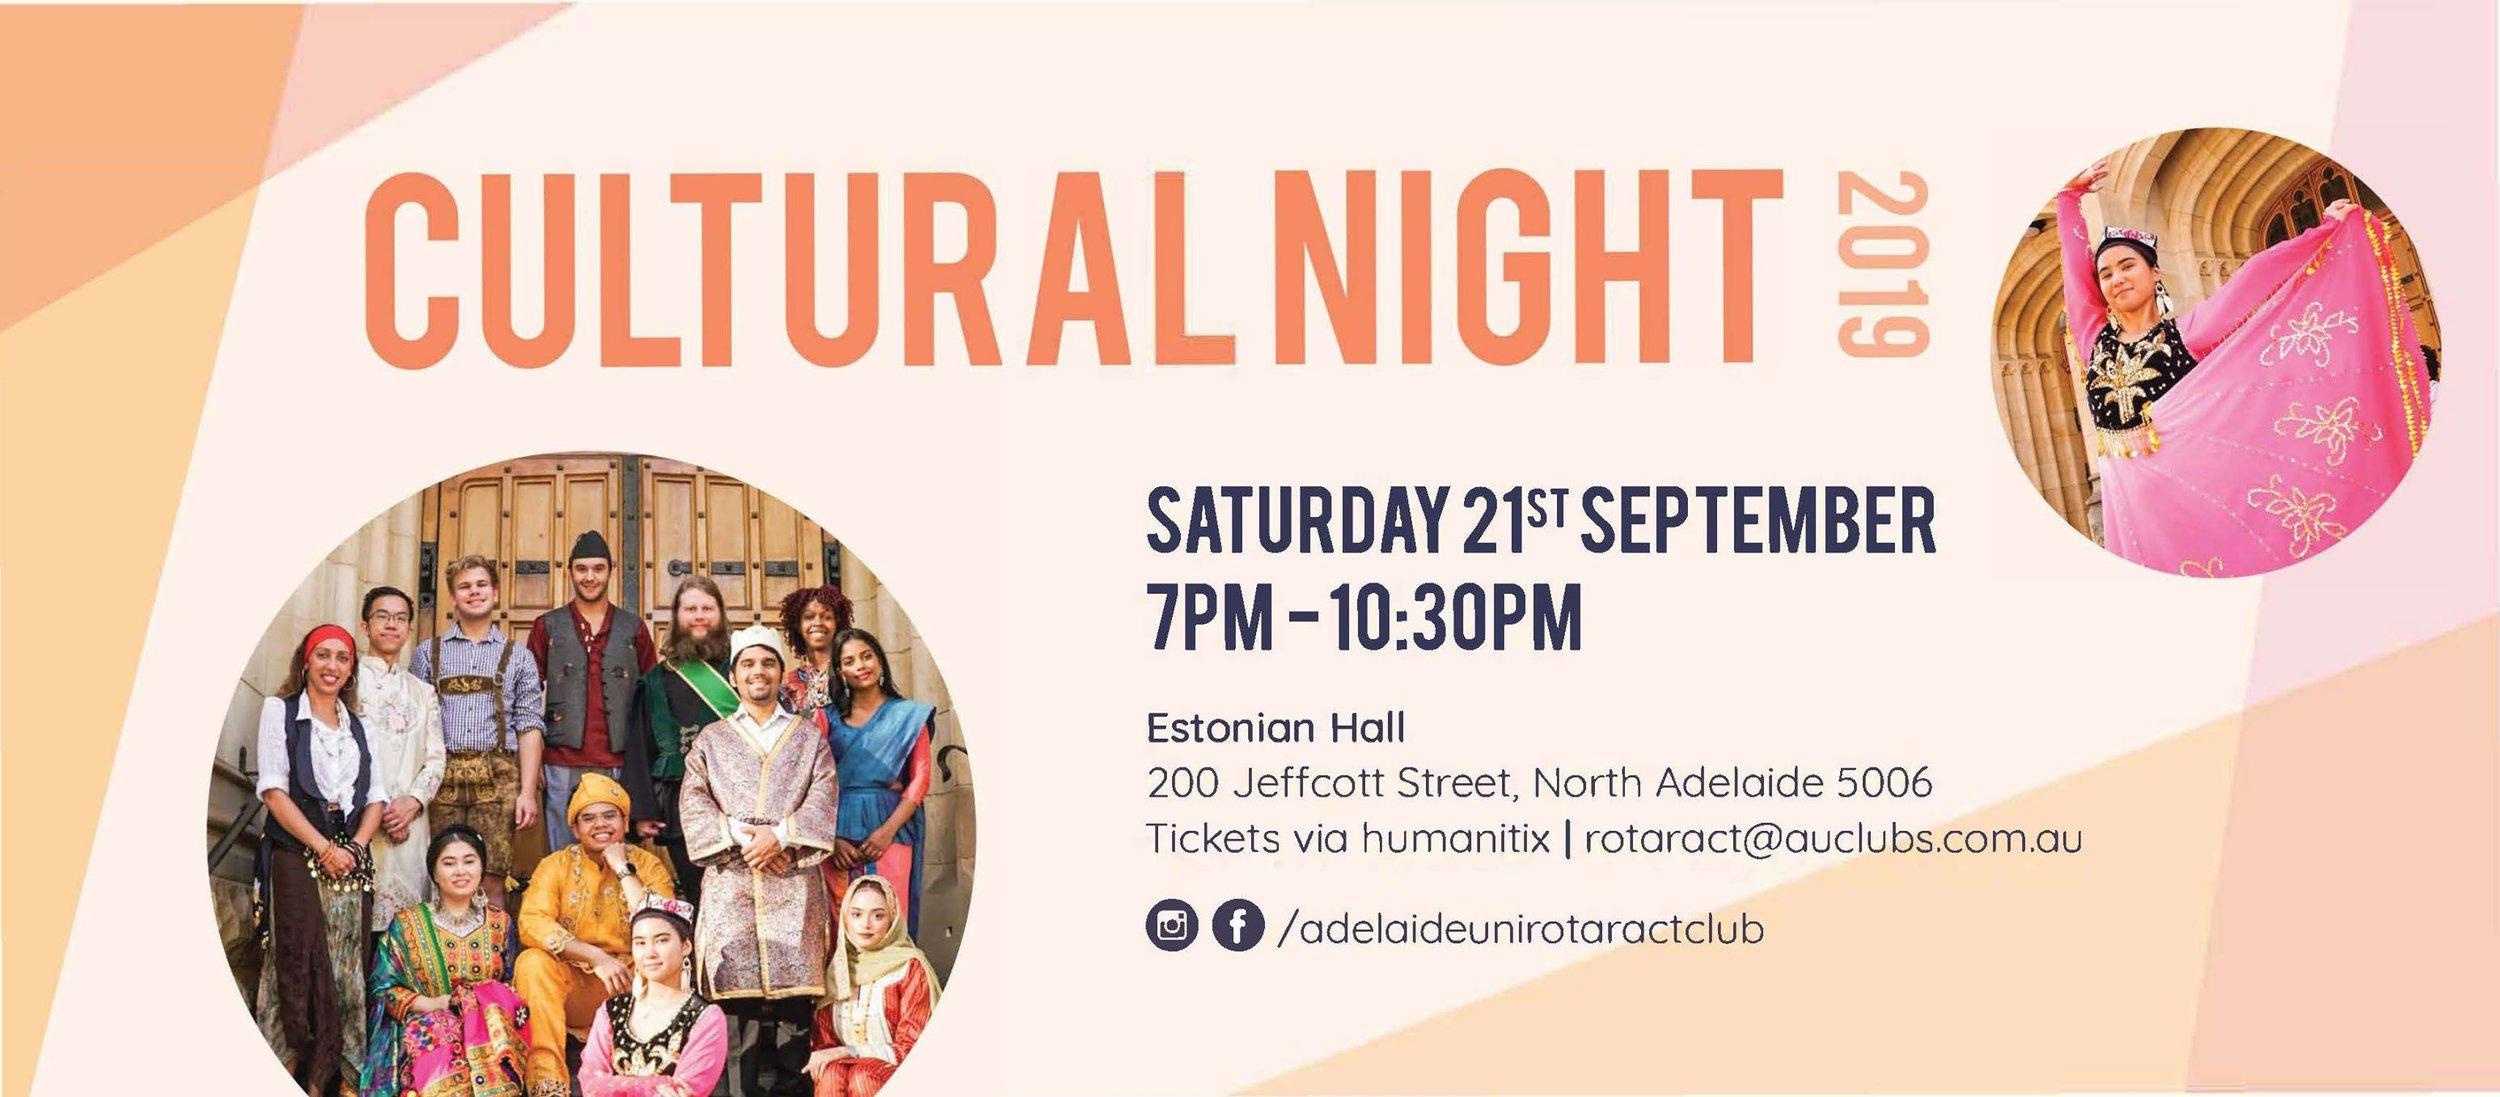 Cultural night 2019.jpg